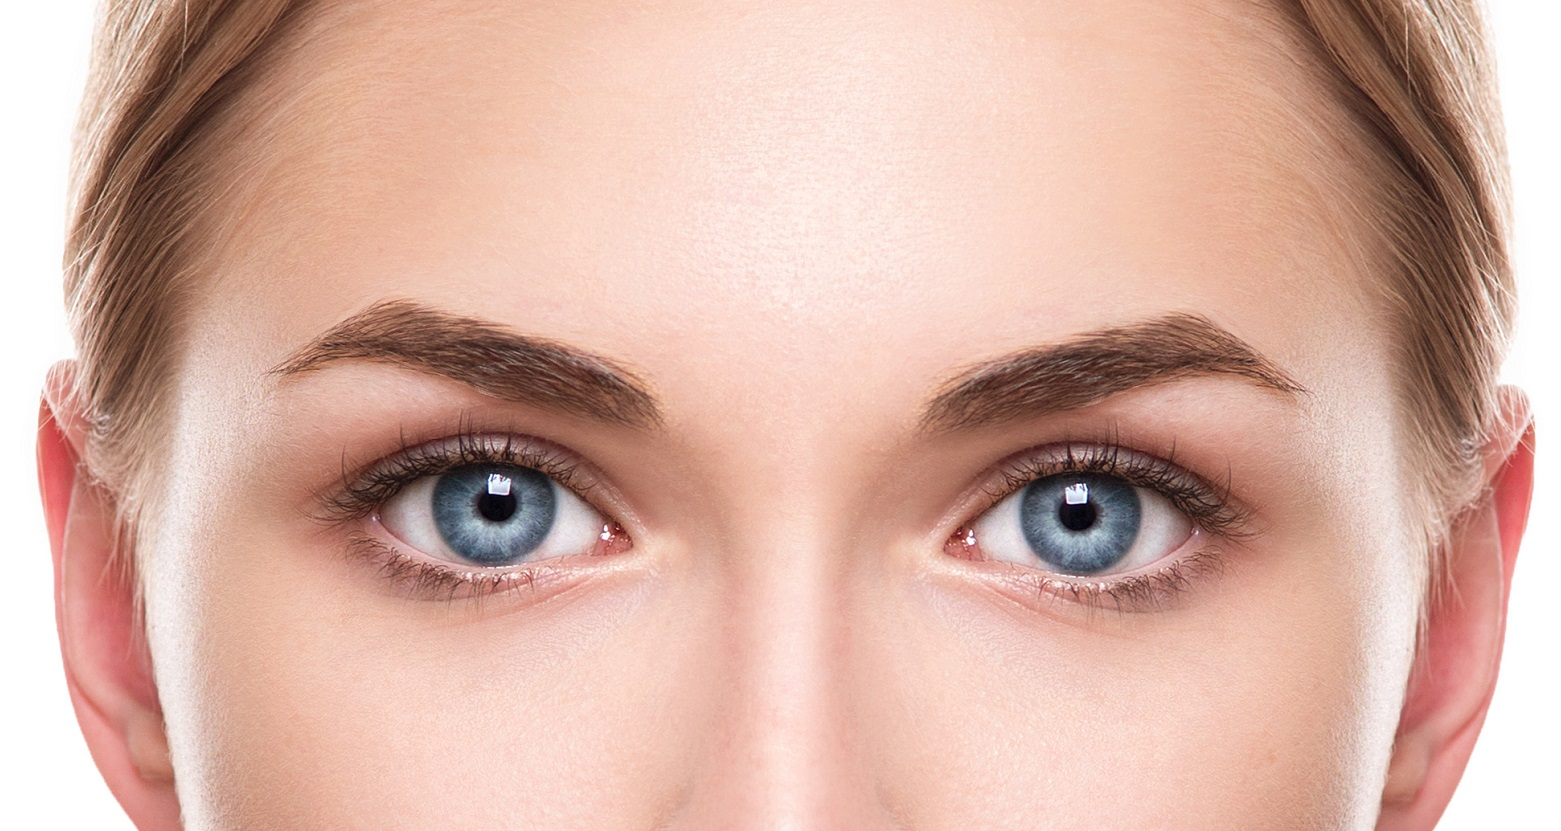 Salons In Bucharest For Stroke By Stroke Eyebrows Micropigmentation